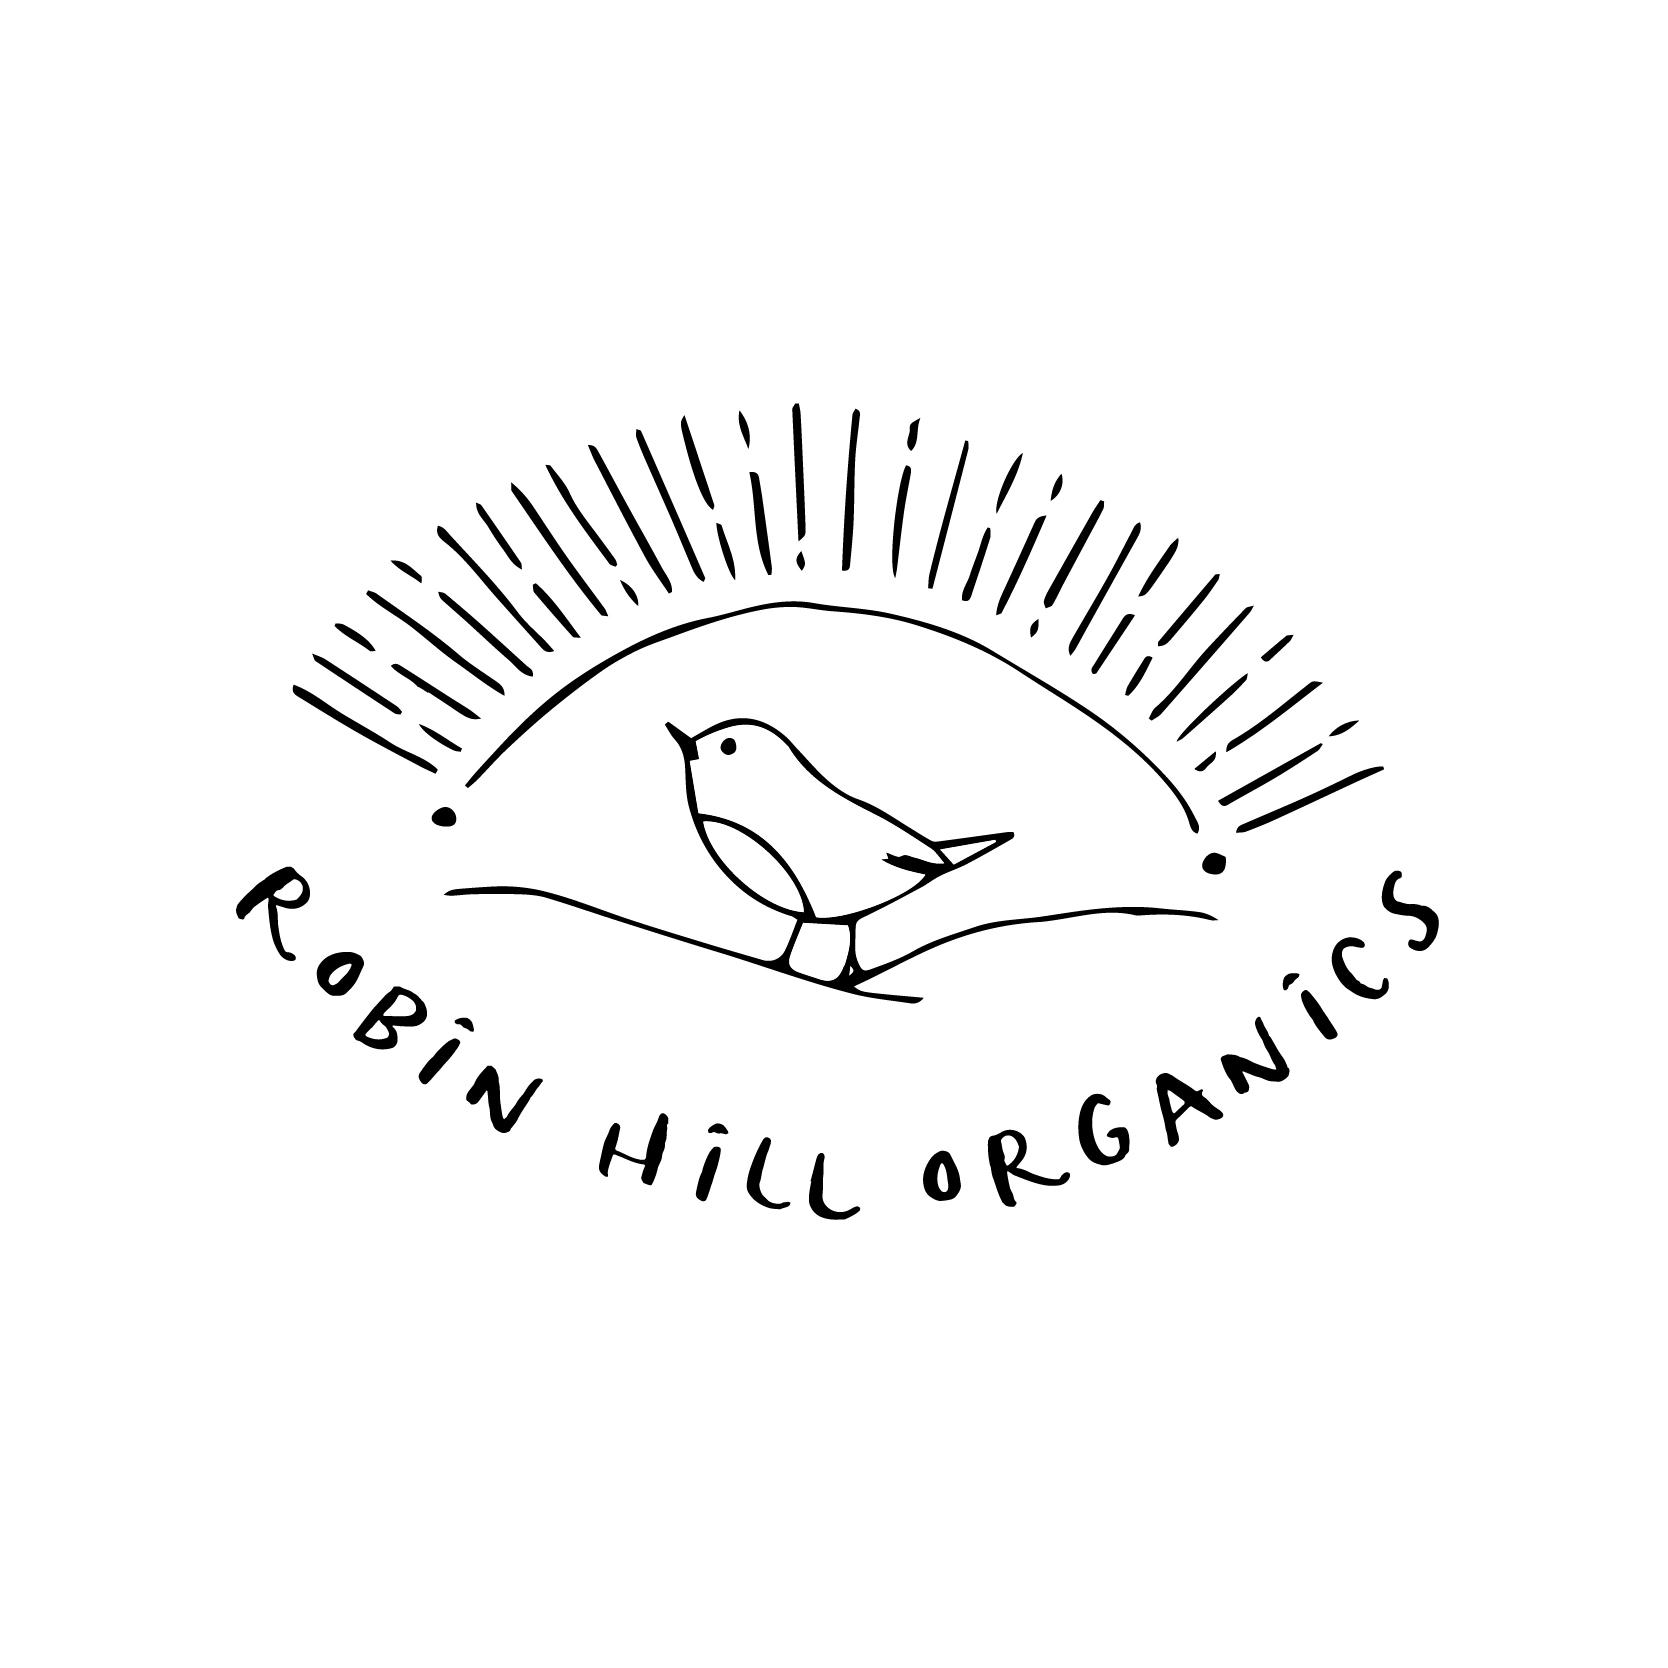 Robin Hill Organics Farm Logo FINAL.jpg